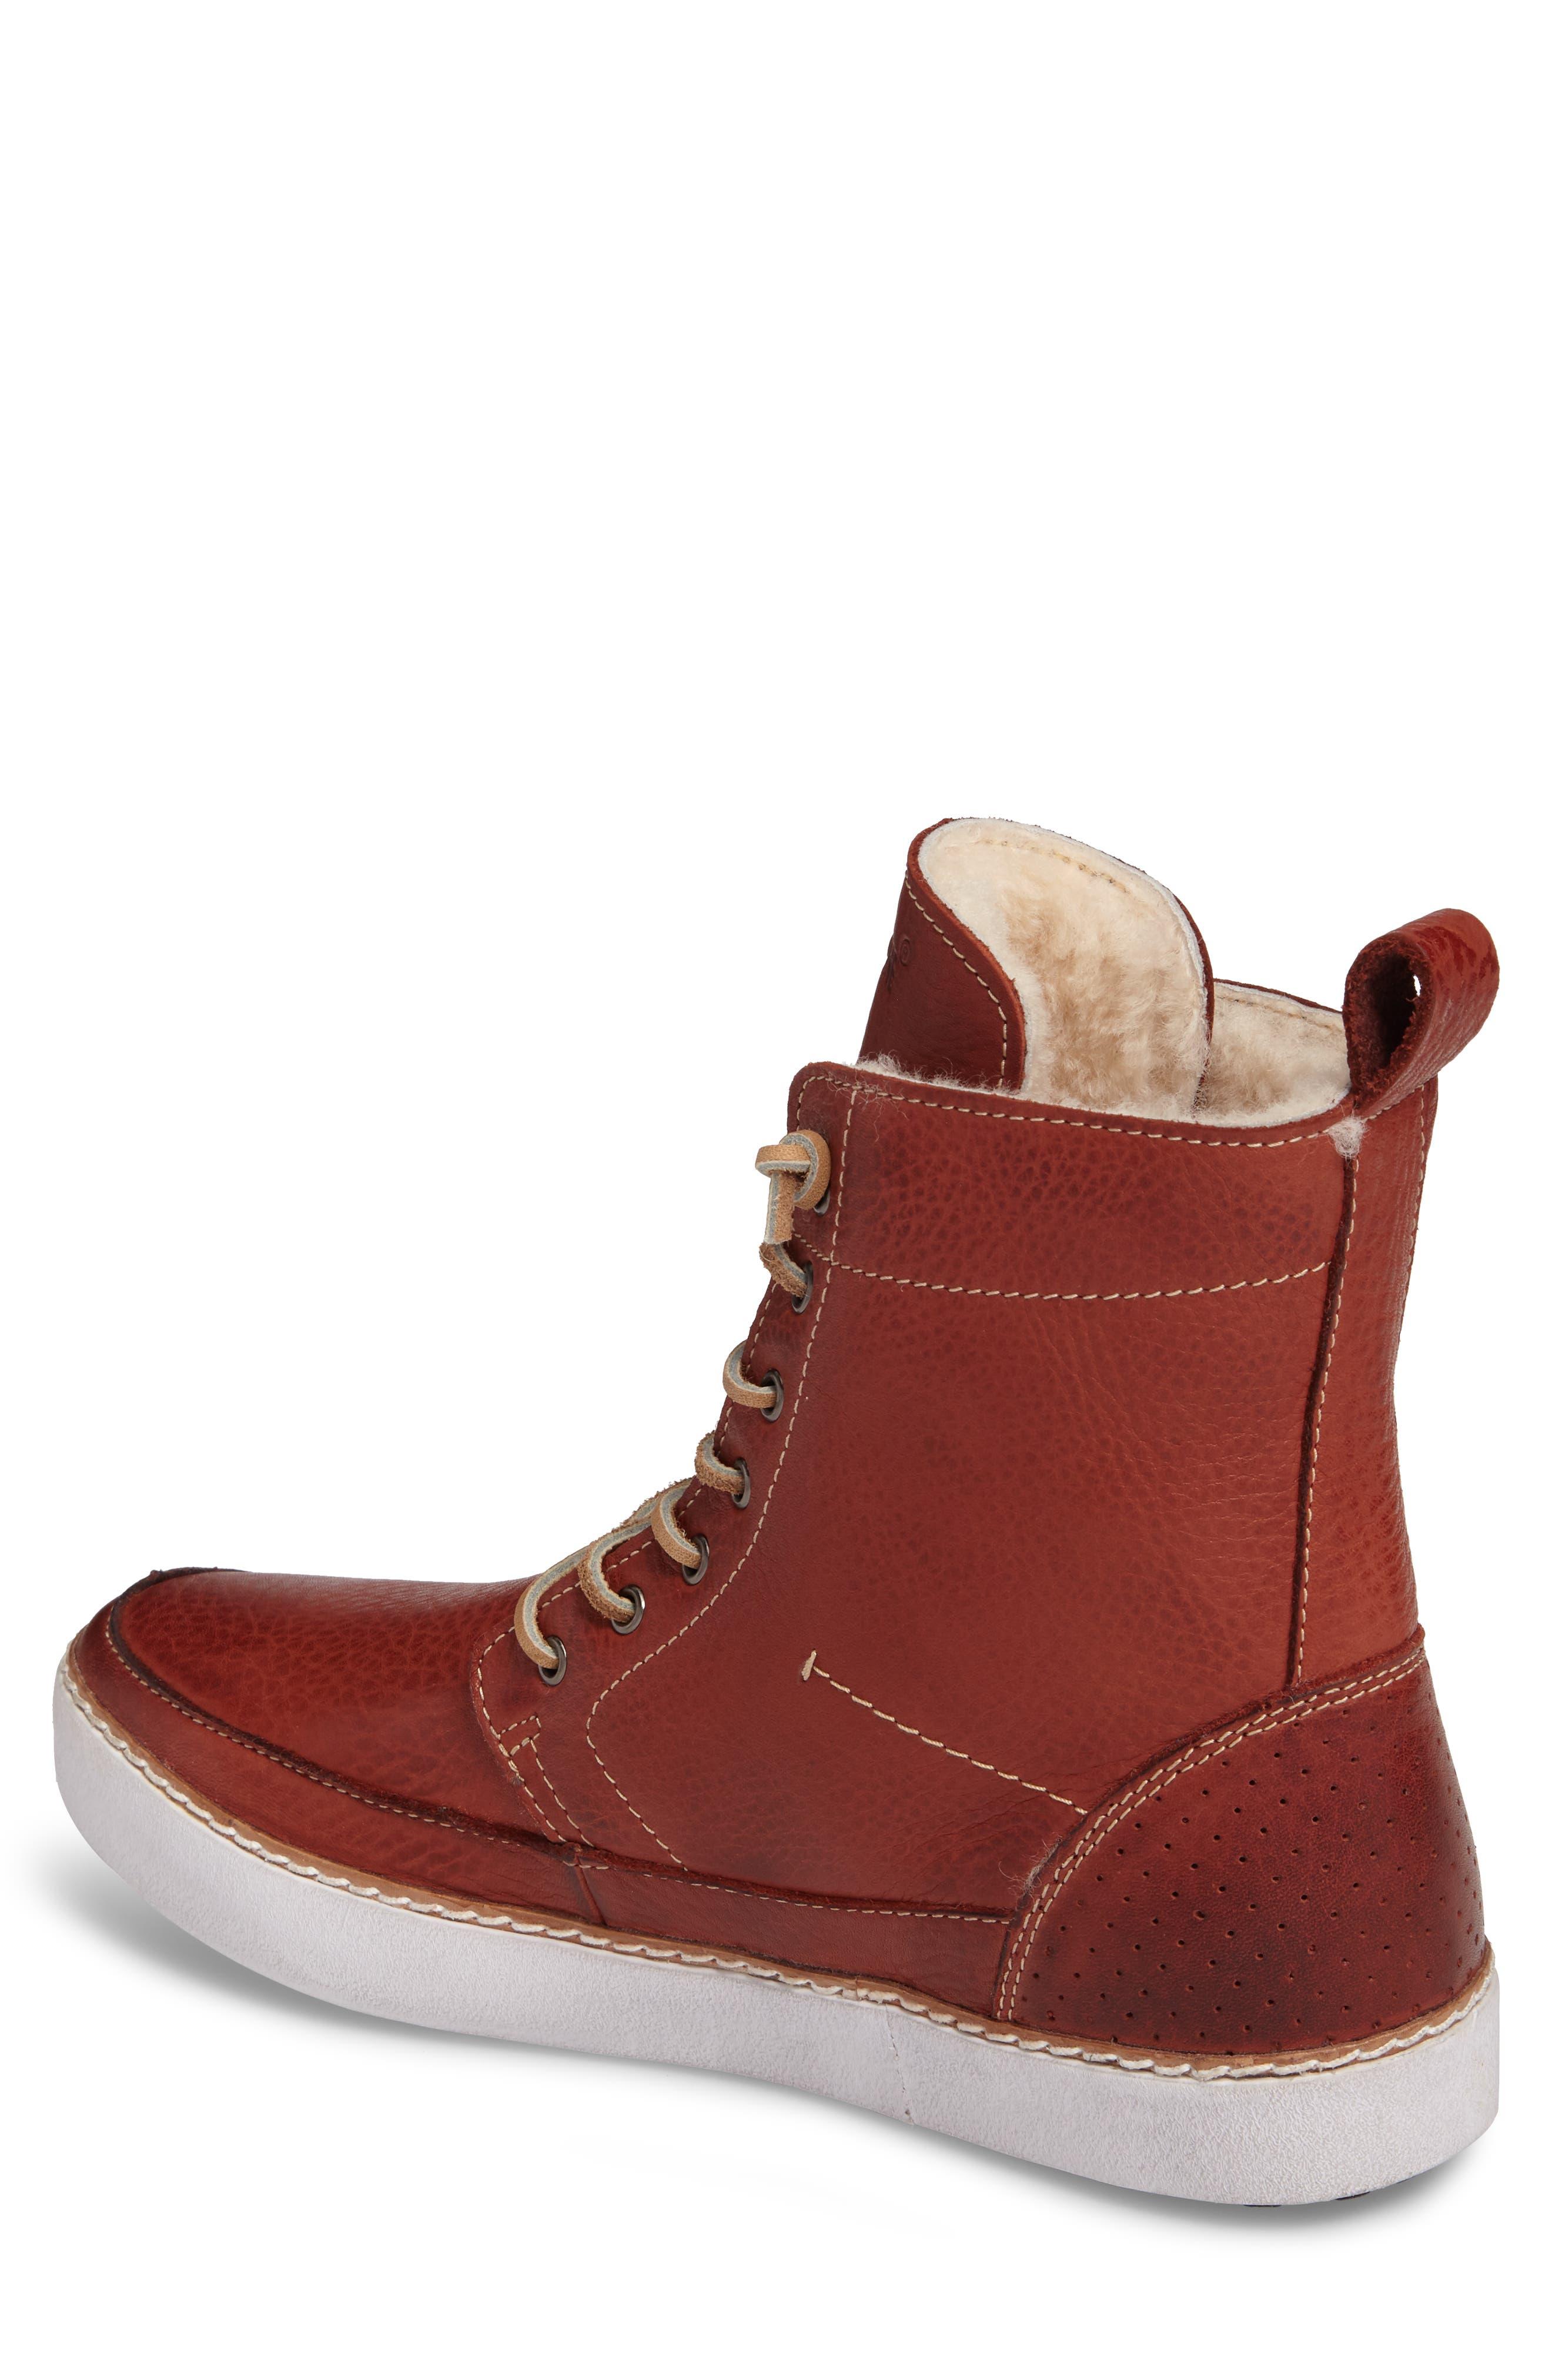 BLACKSTONE,                             'AM 32' Shearling Lined Boot,                             Alternate thumbnail 2, color,                             200